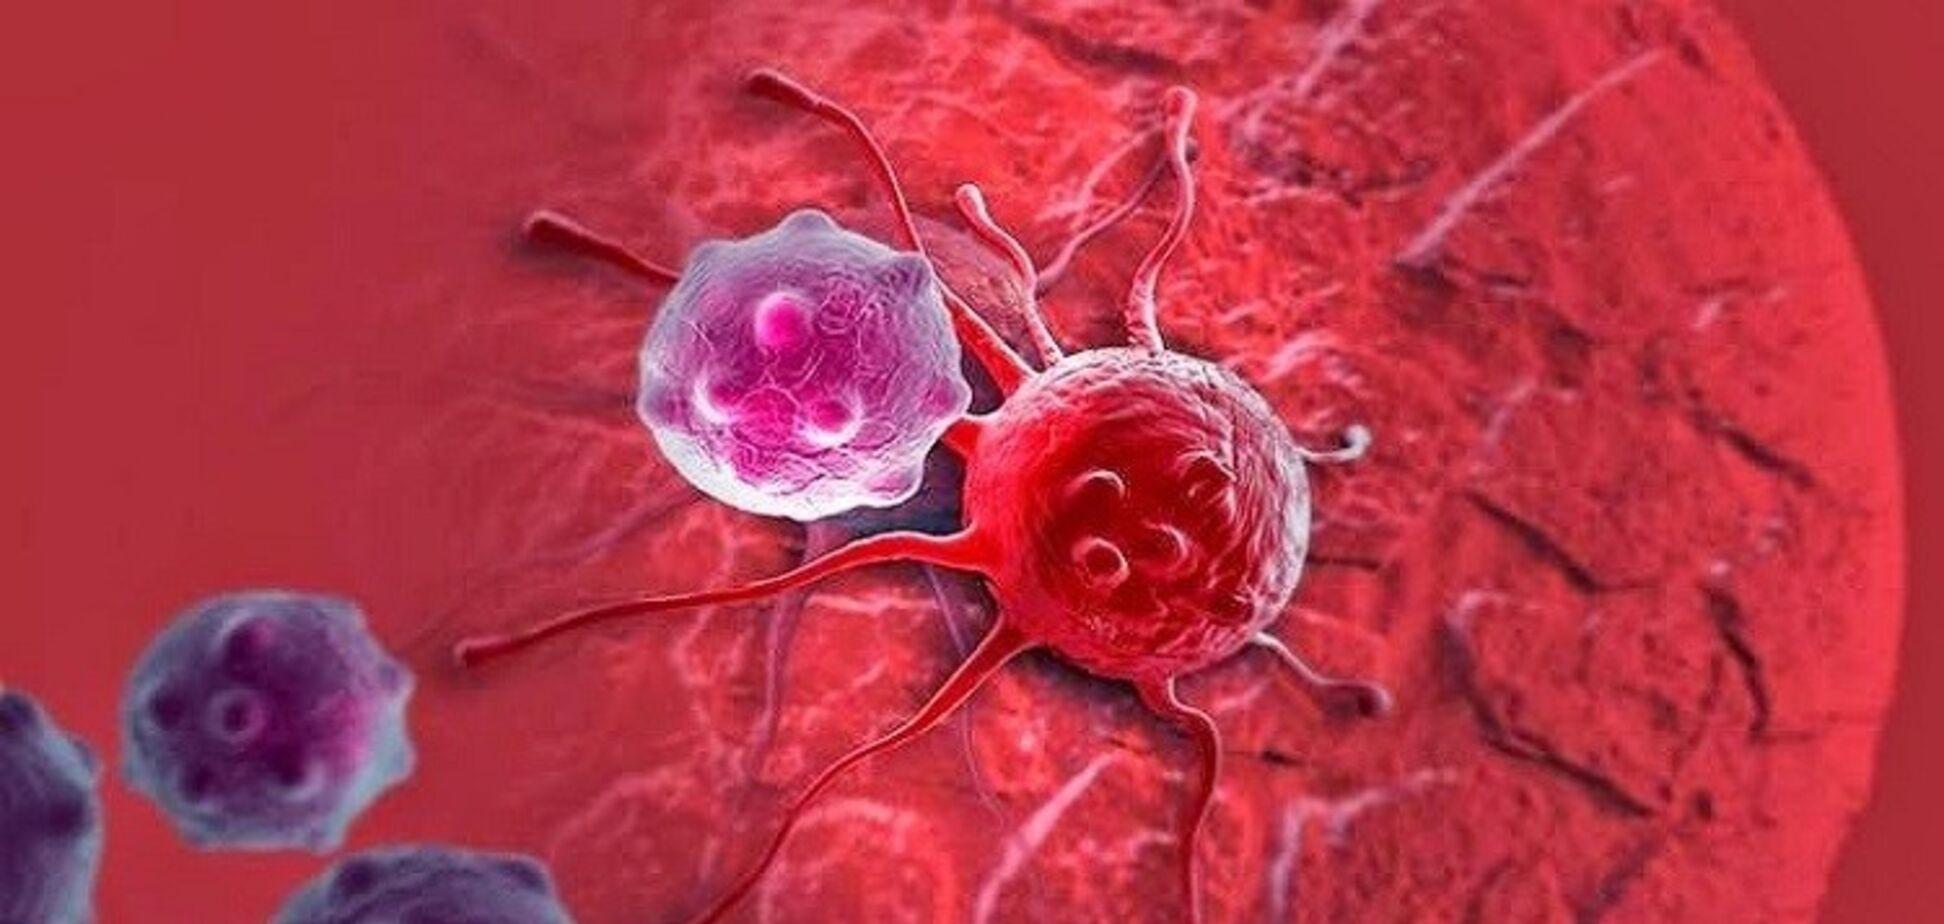 Секретные агенты рака: как убивают канцерогены